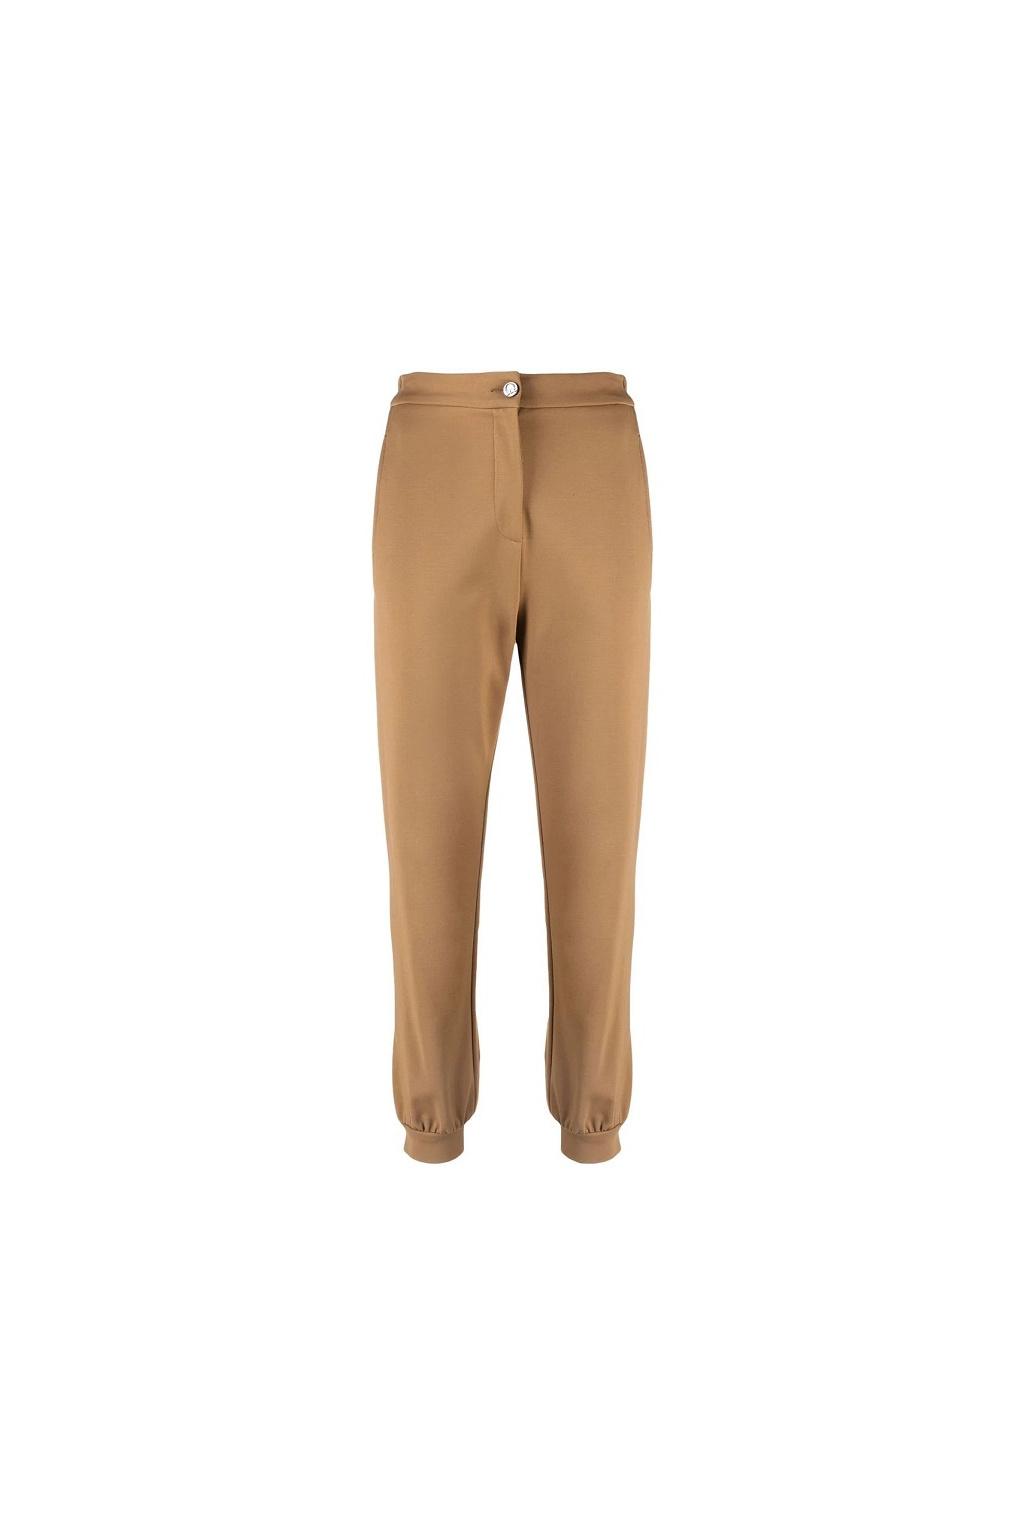 Dámské kalhoty Pinko Arbus hnědé